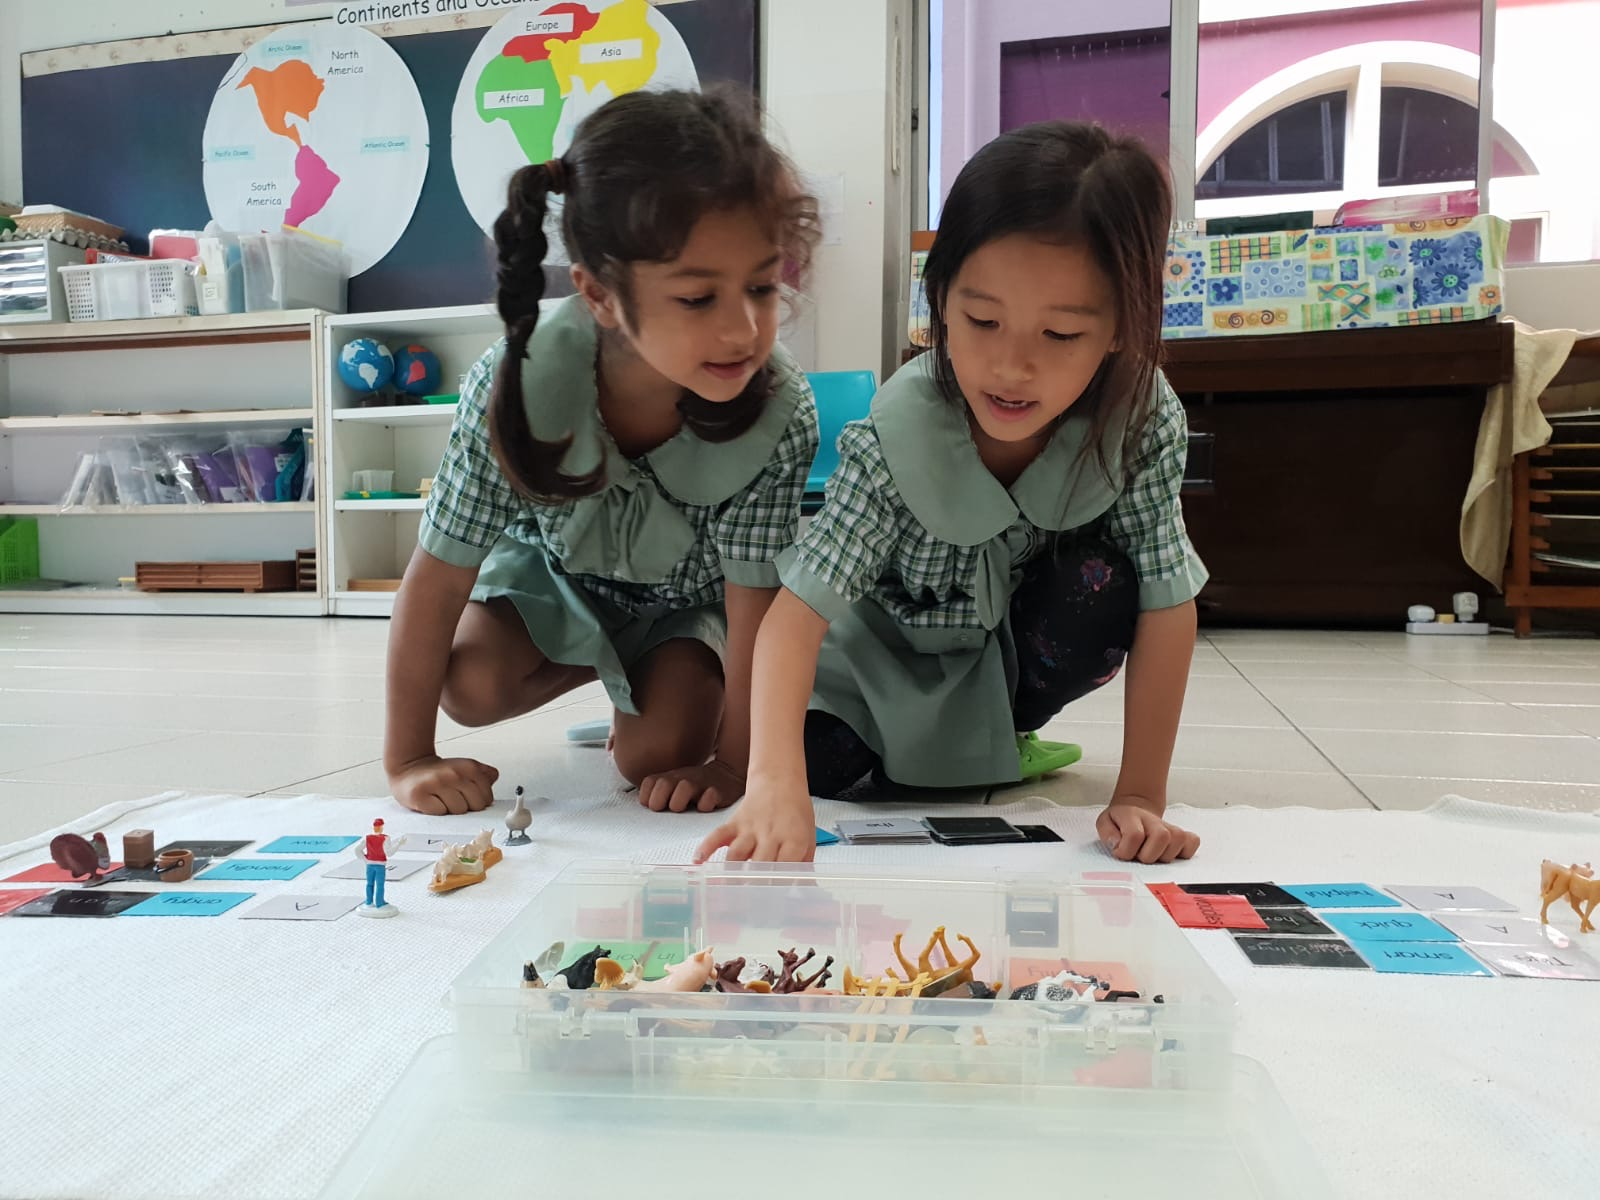 Pearlbank Montessori kindergarten